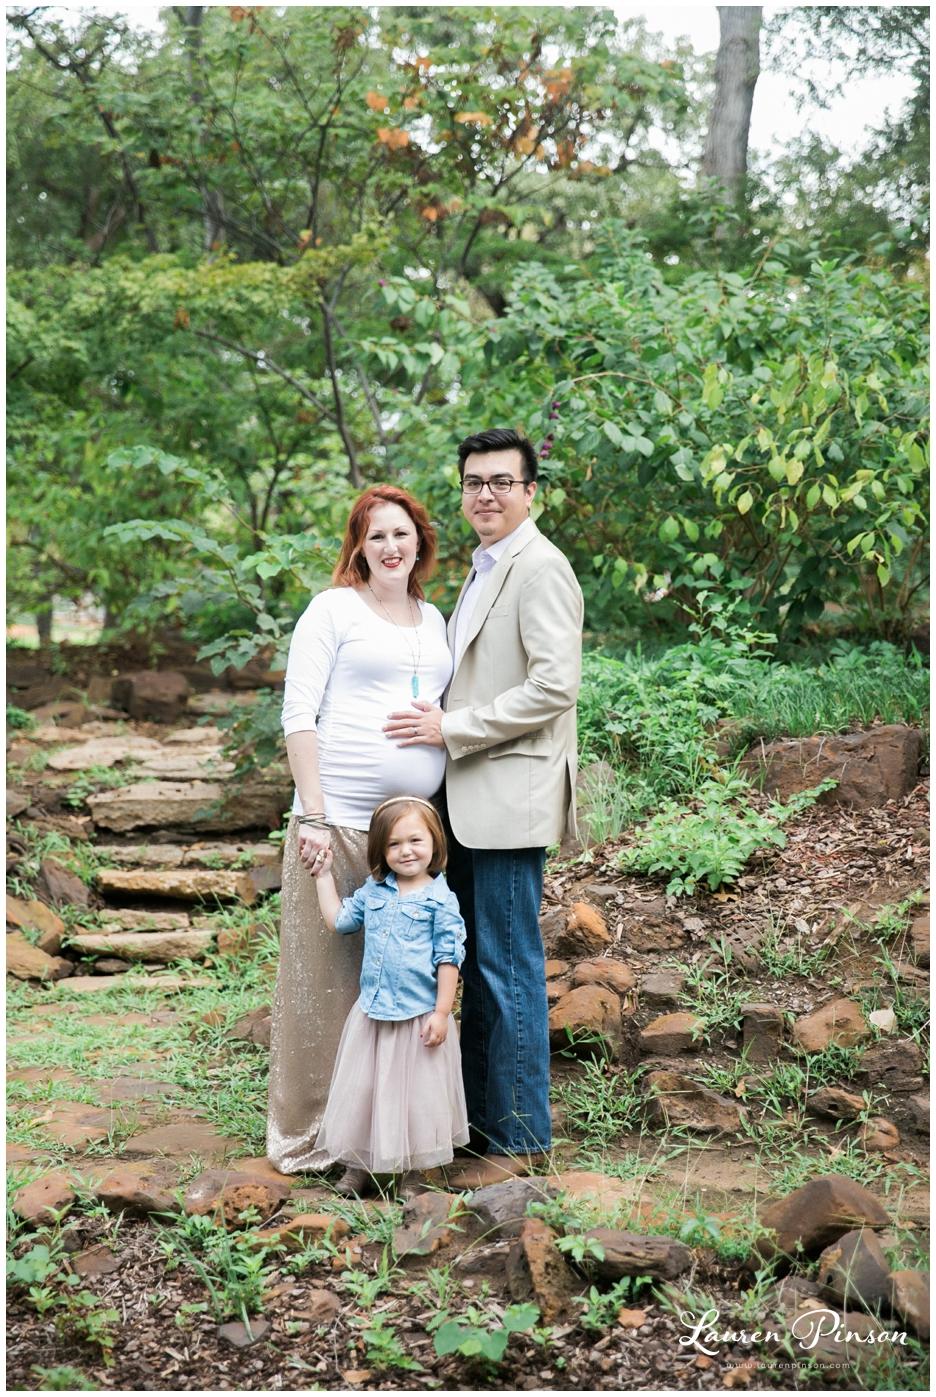 wichita-falls-child-family-portrait-photographer_1285.jpg